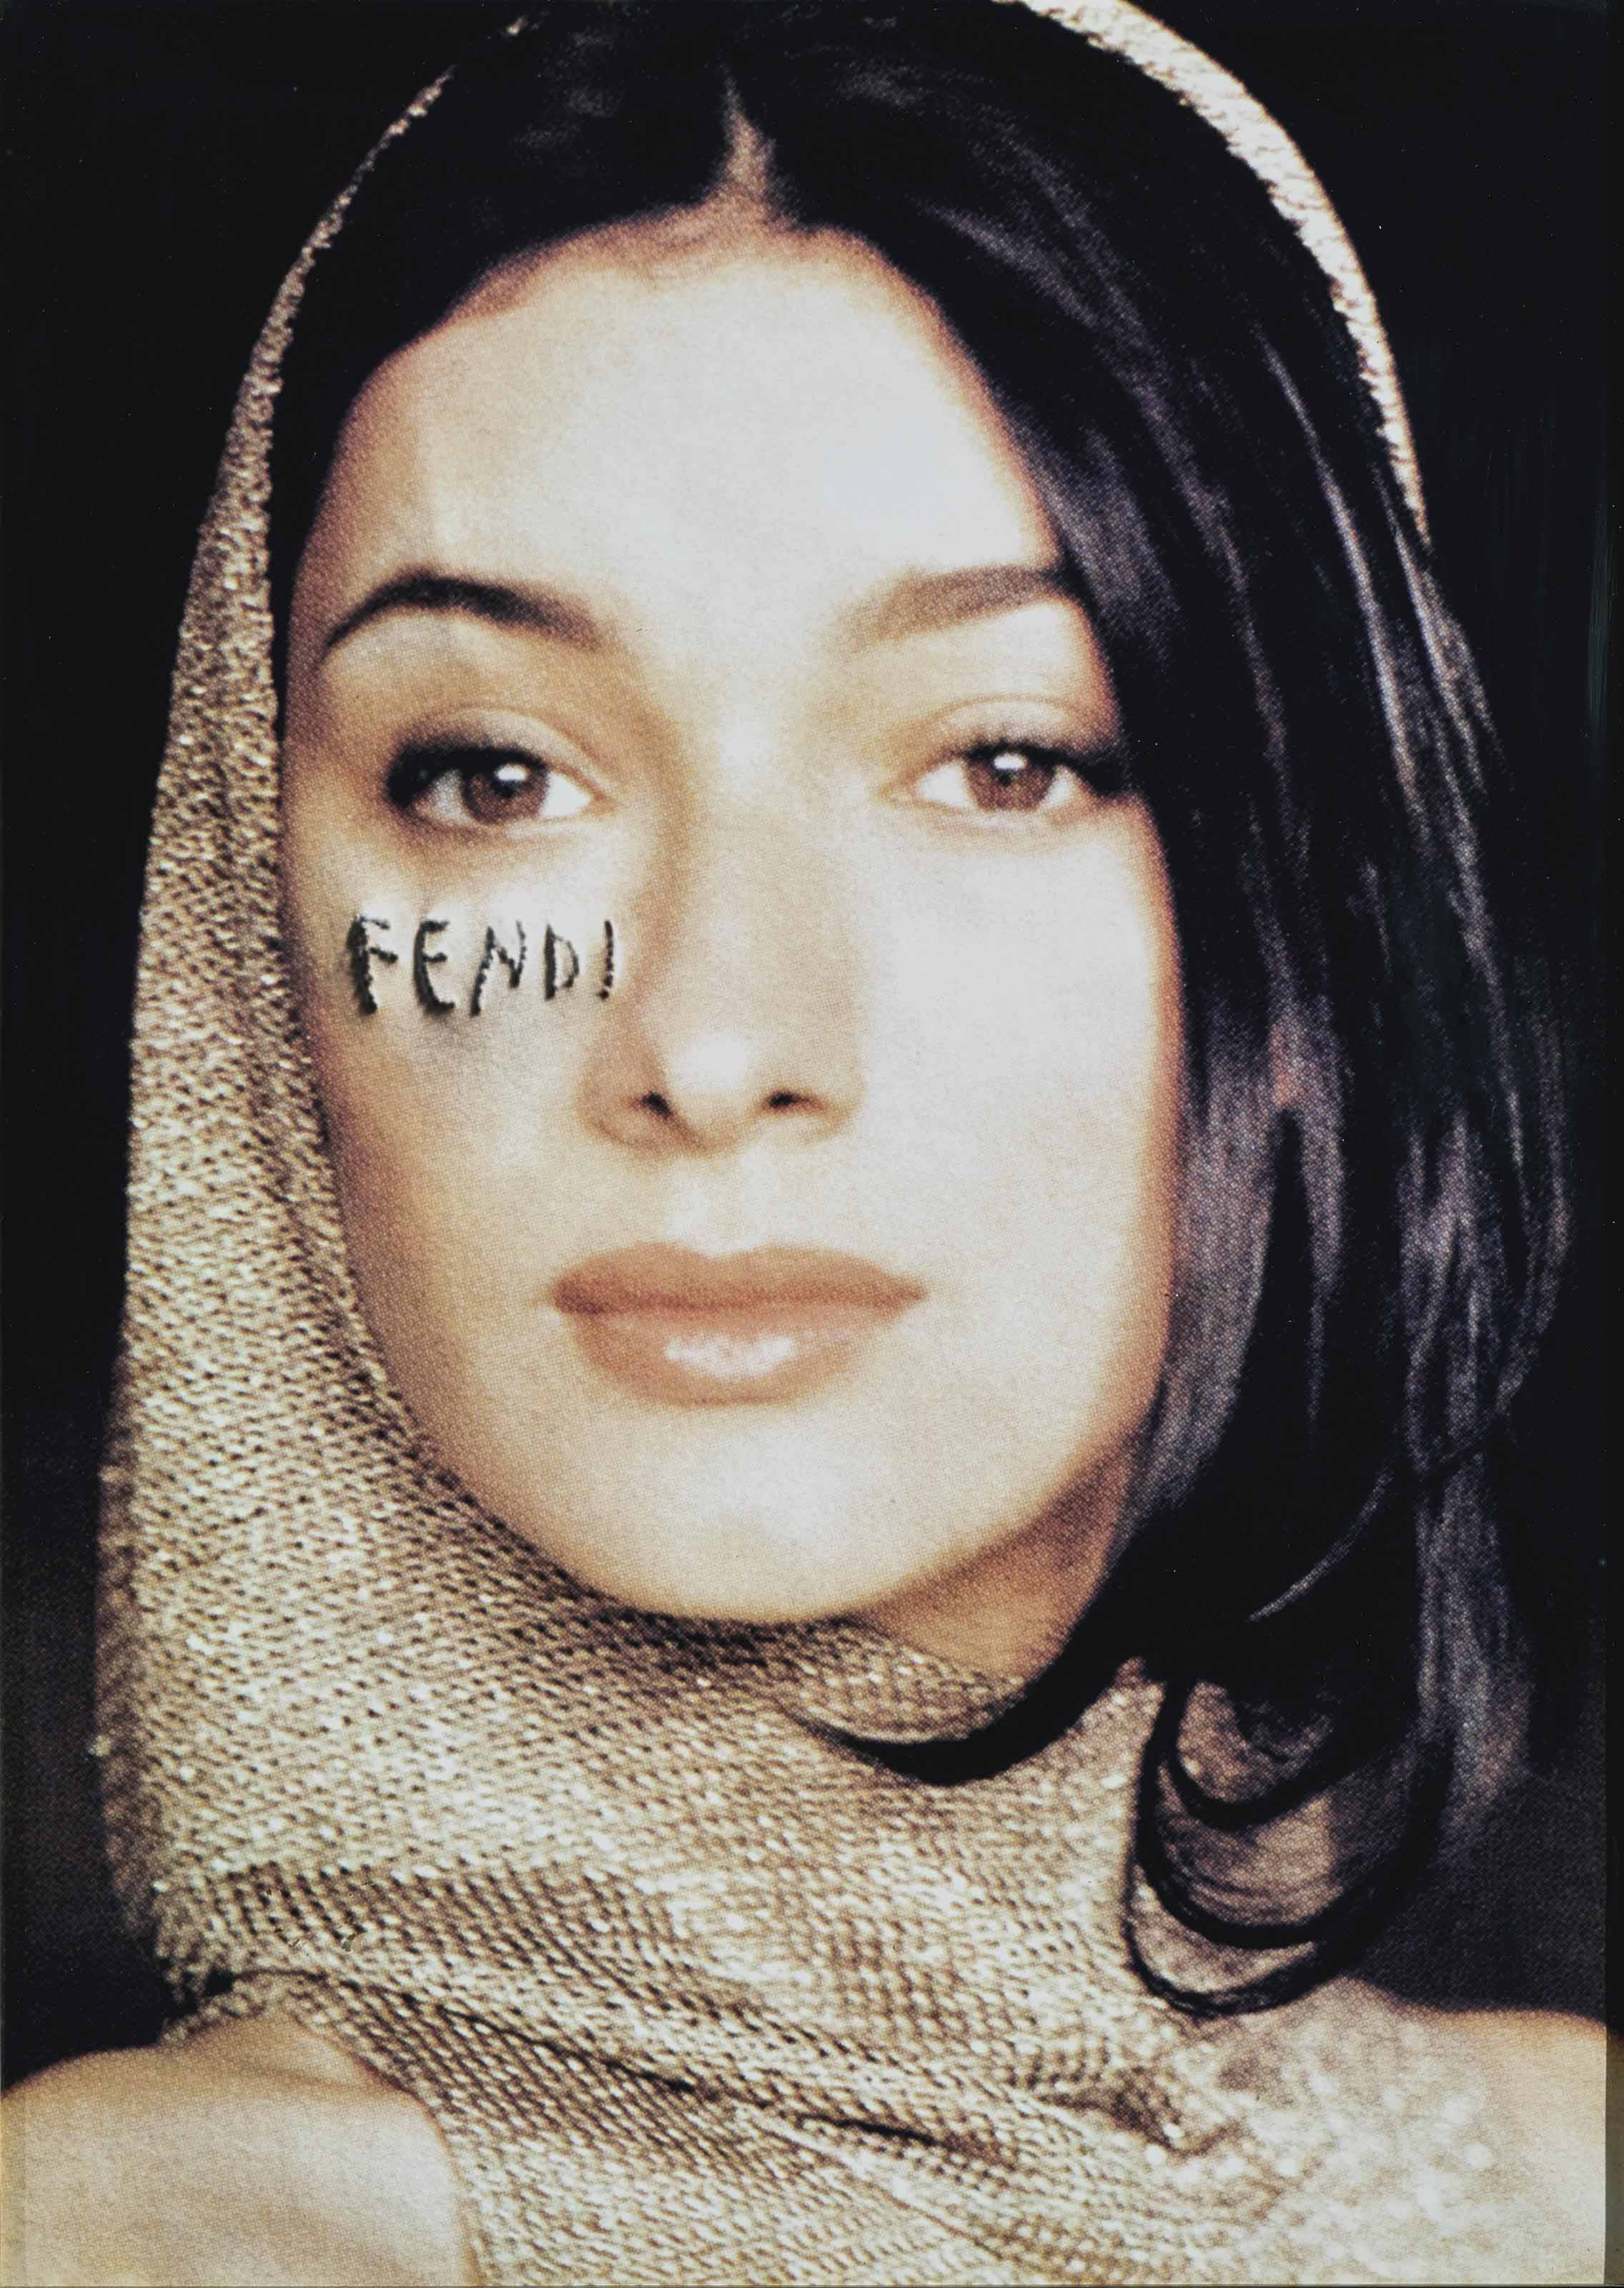 Fendi, 2003